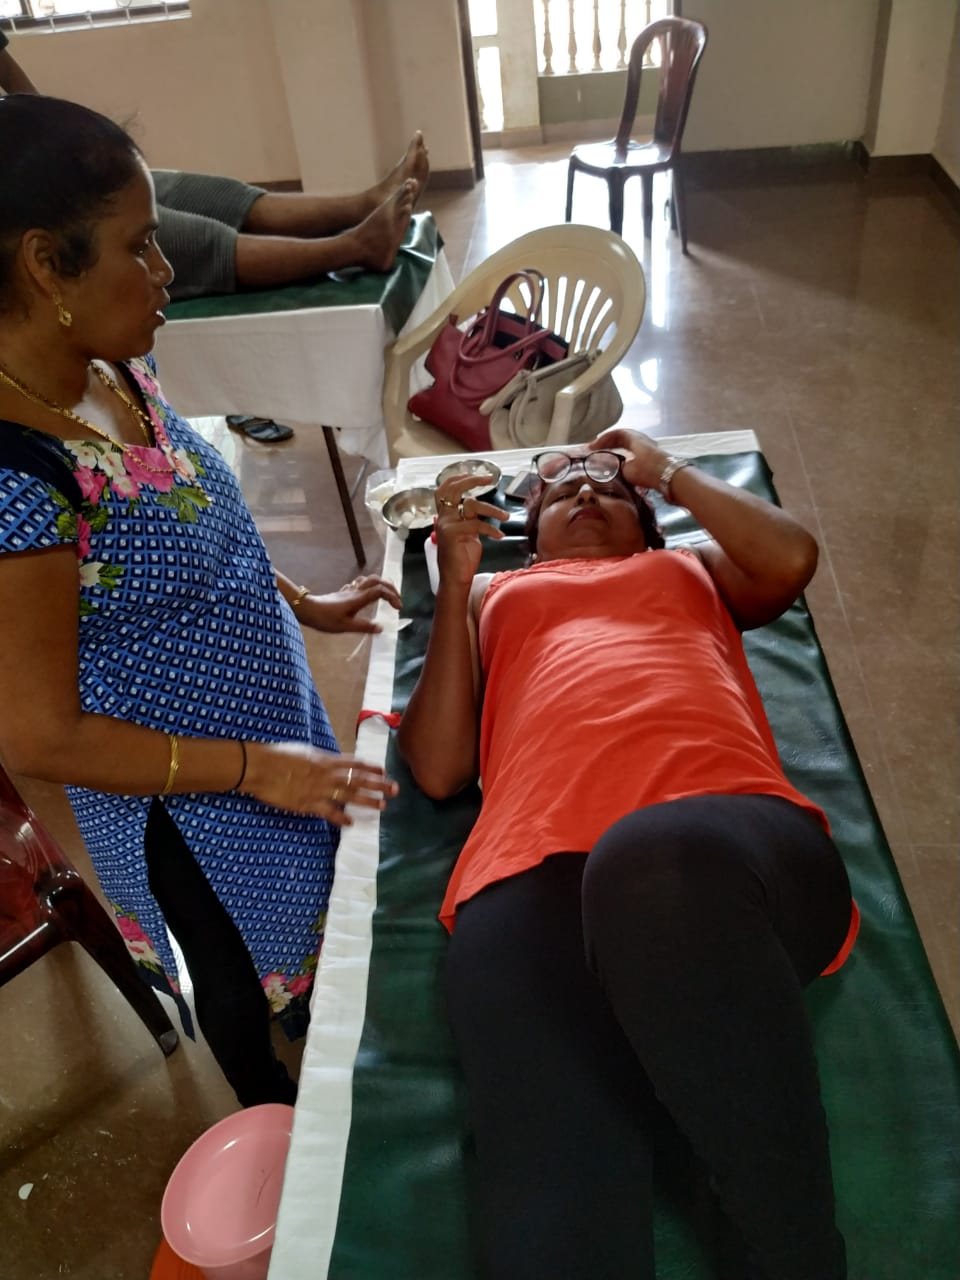 Sita_donating_blood.jpg